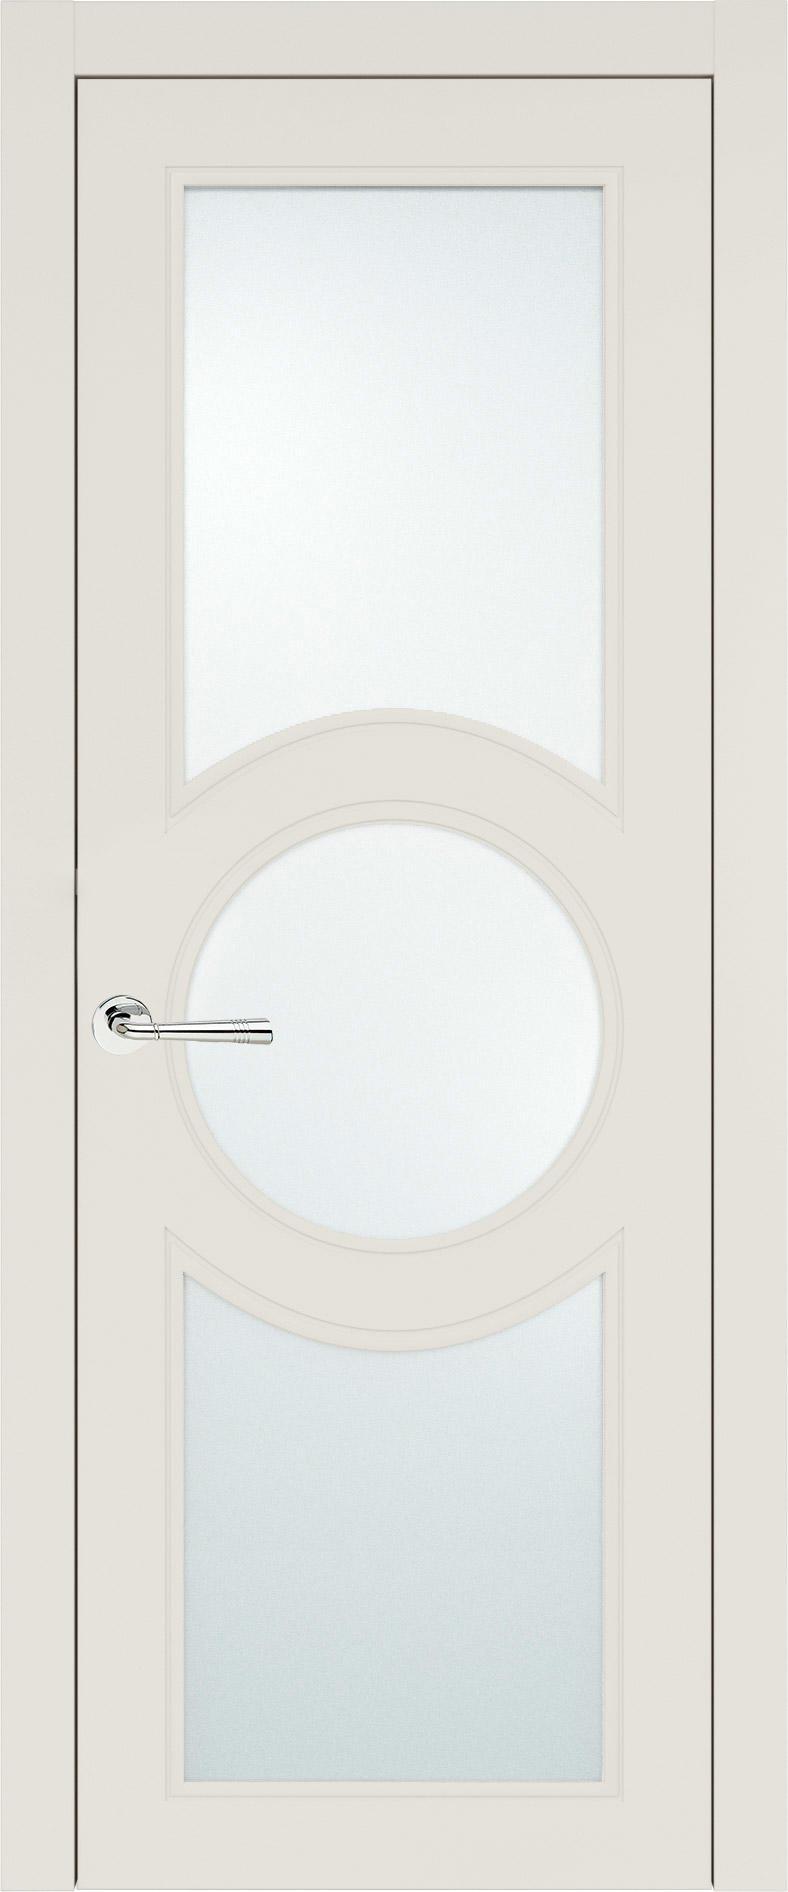 Ravenna Neo Classic цвет - Бежевая эмаль (RAL 9010) Со стеклом (ДО)